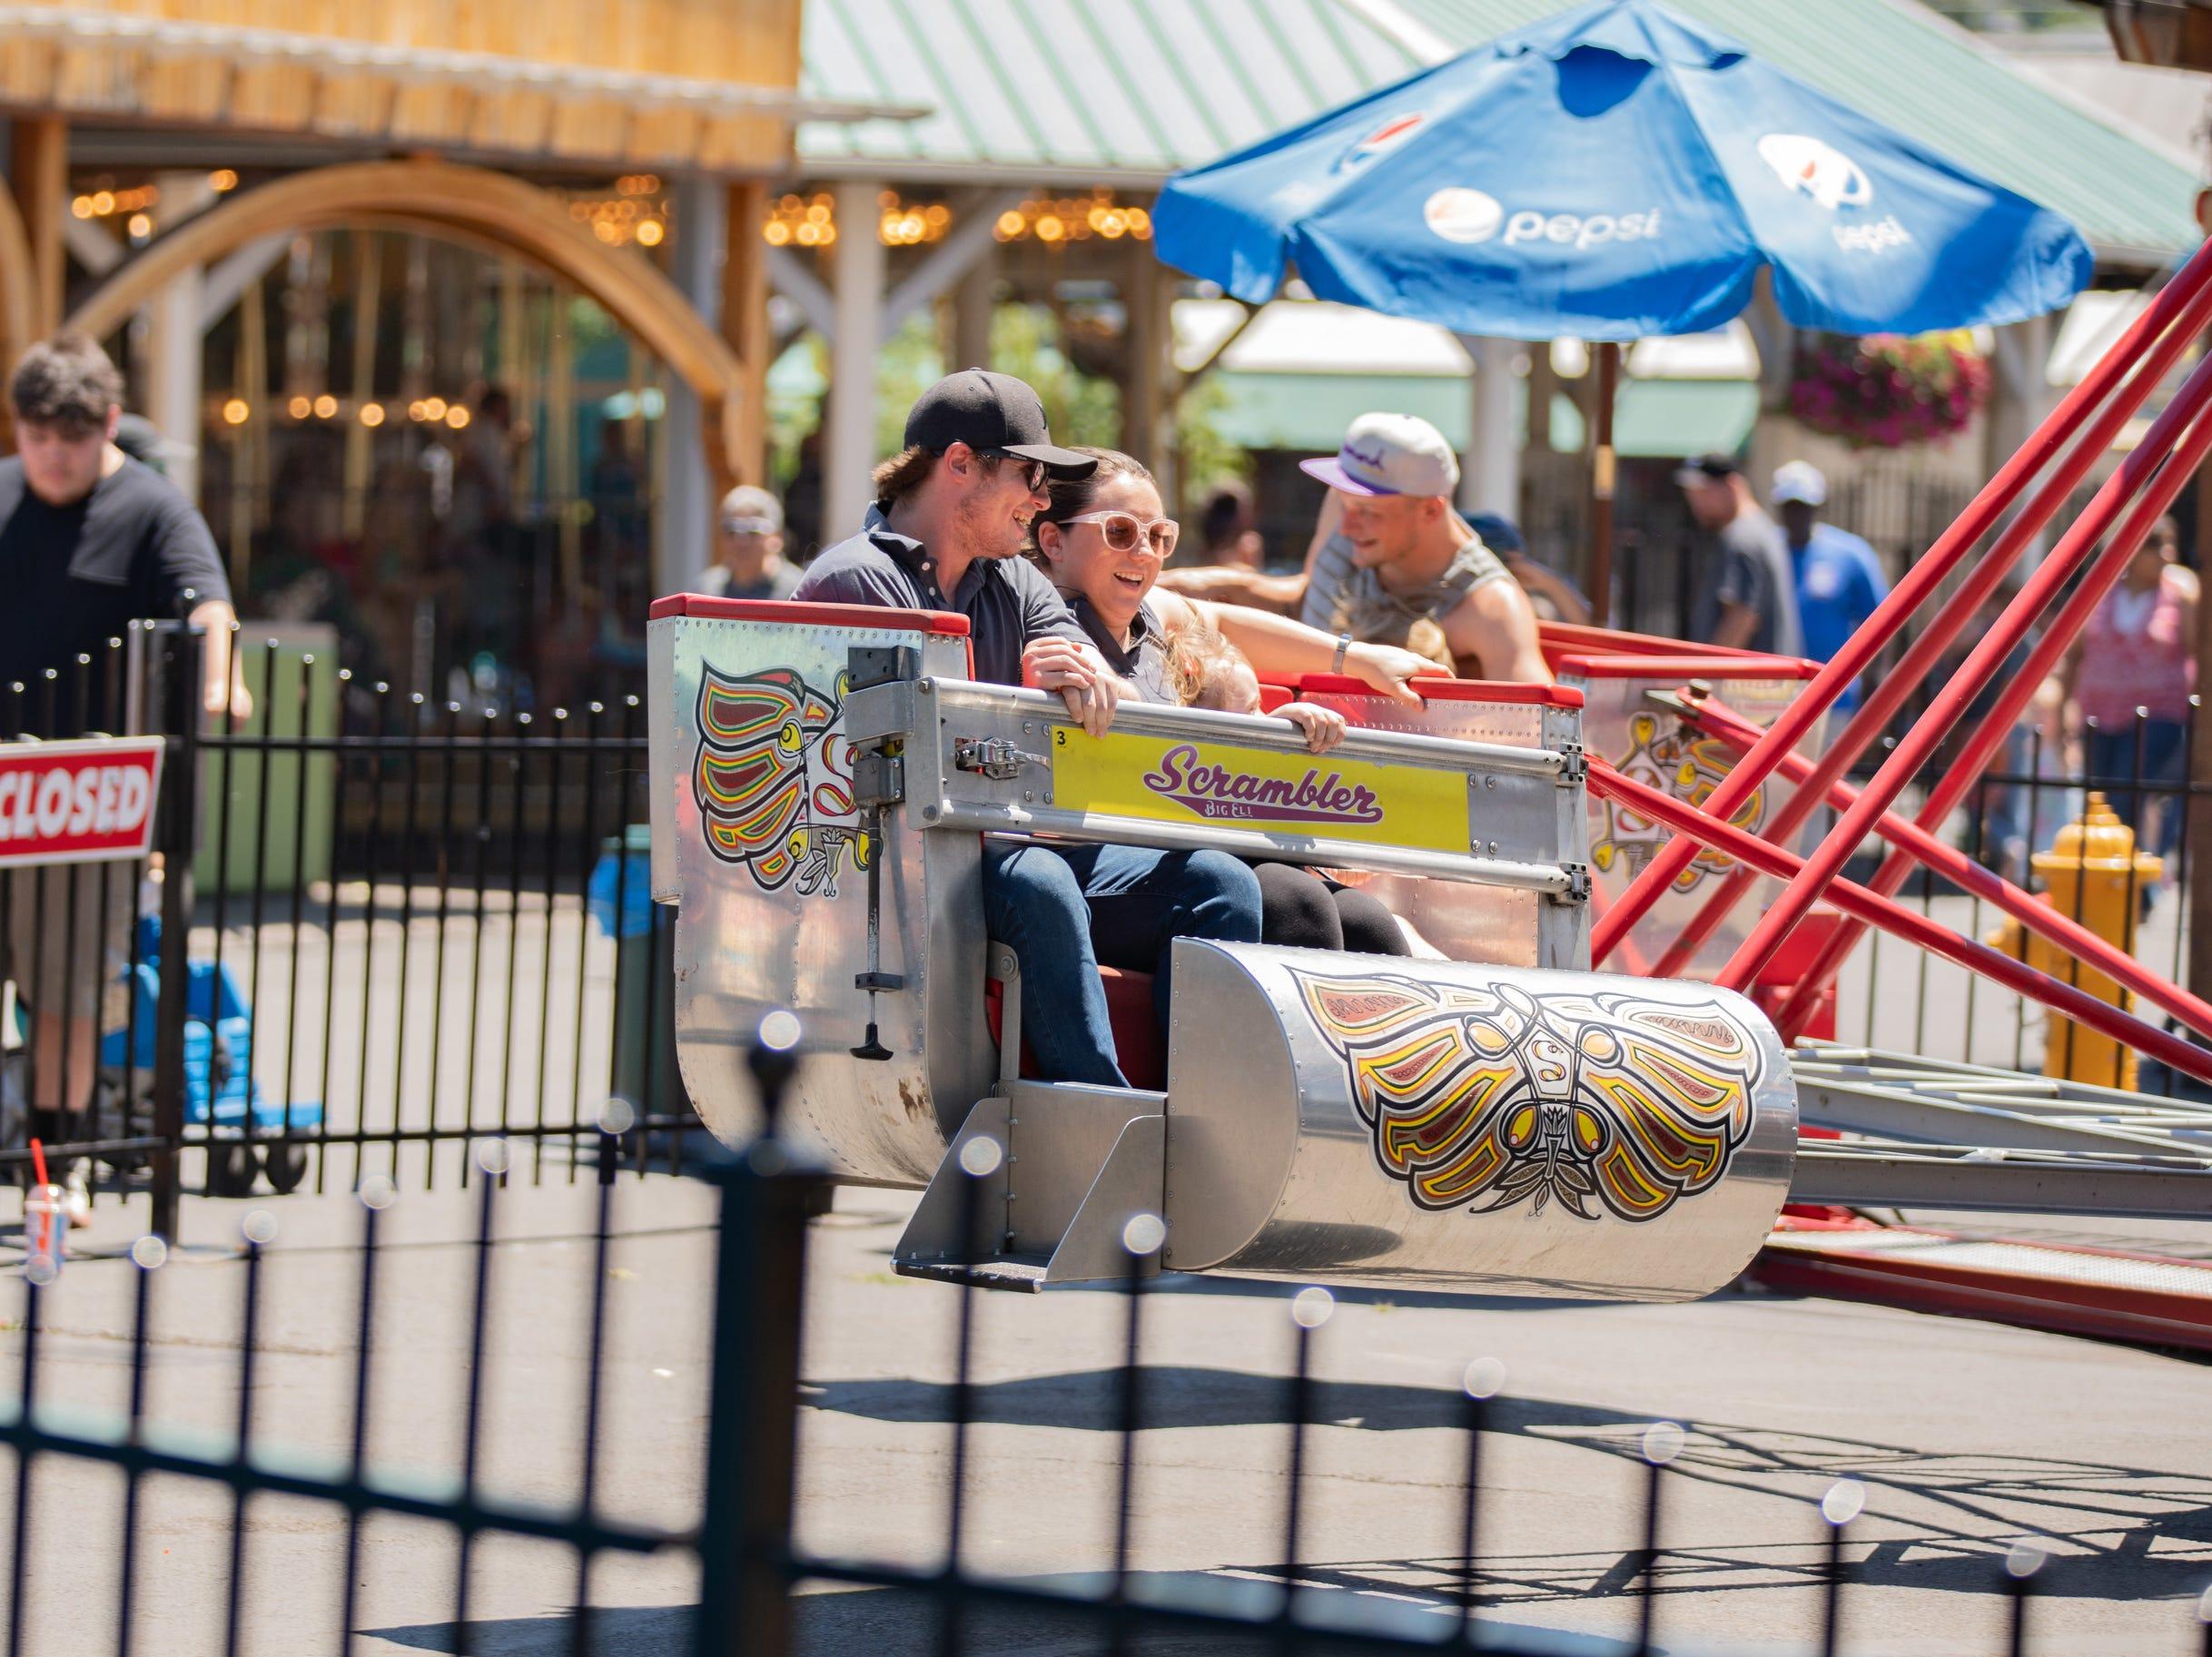 Take a ride on The Scrambler this season at Clementon Park.